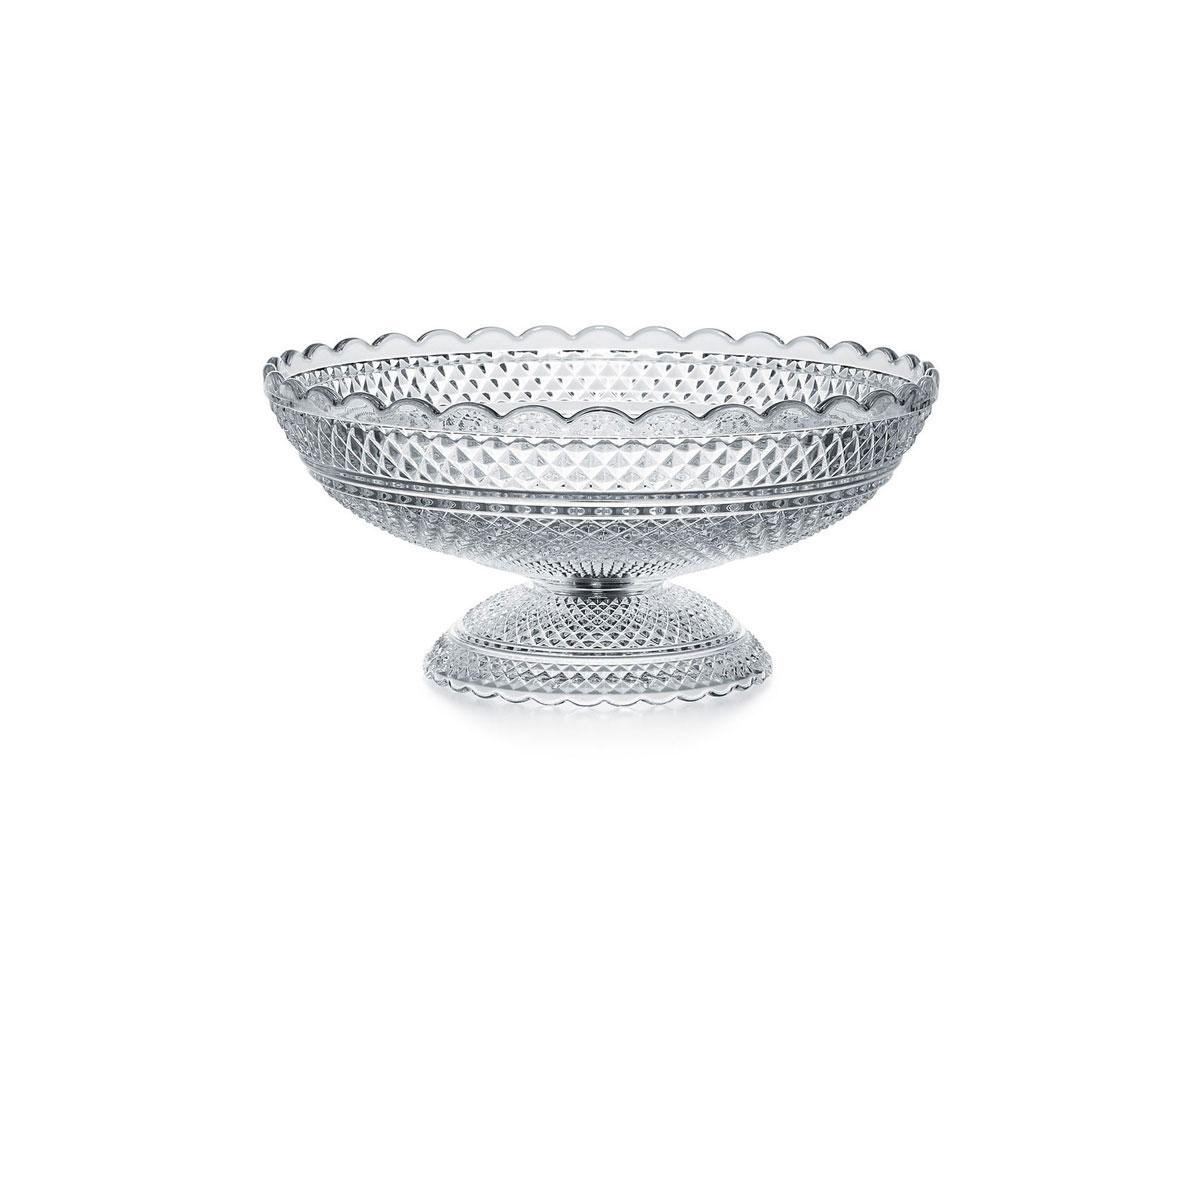 "Baccarat Crystal, Diamant 11"" Crystal Bowl"